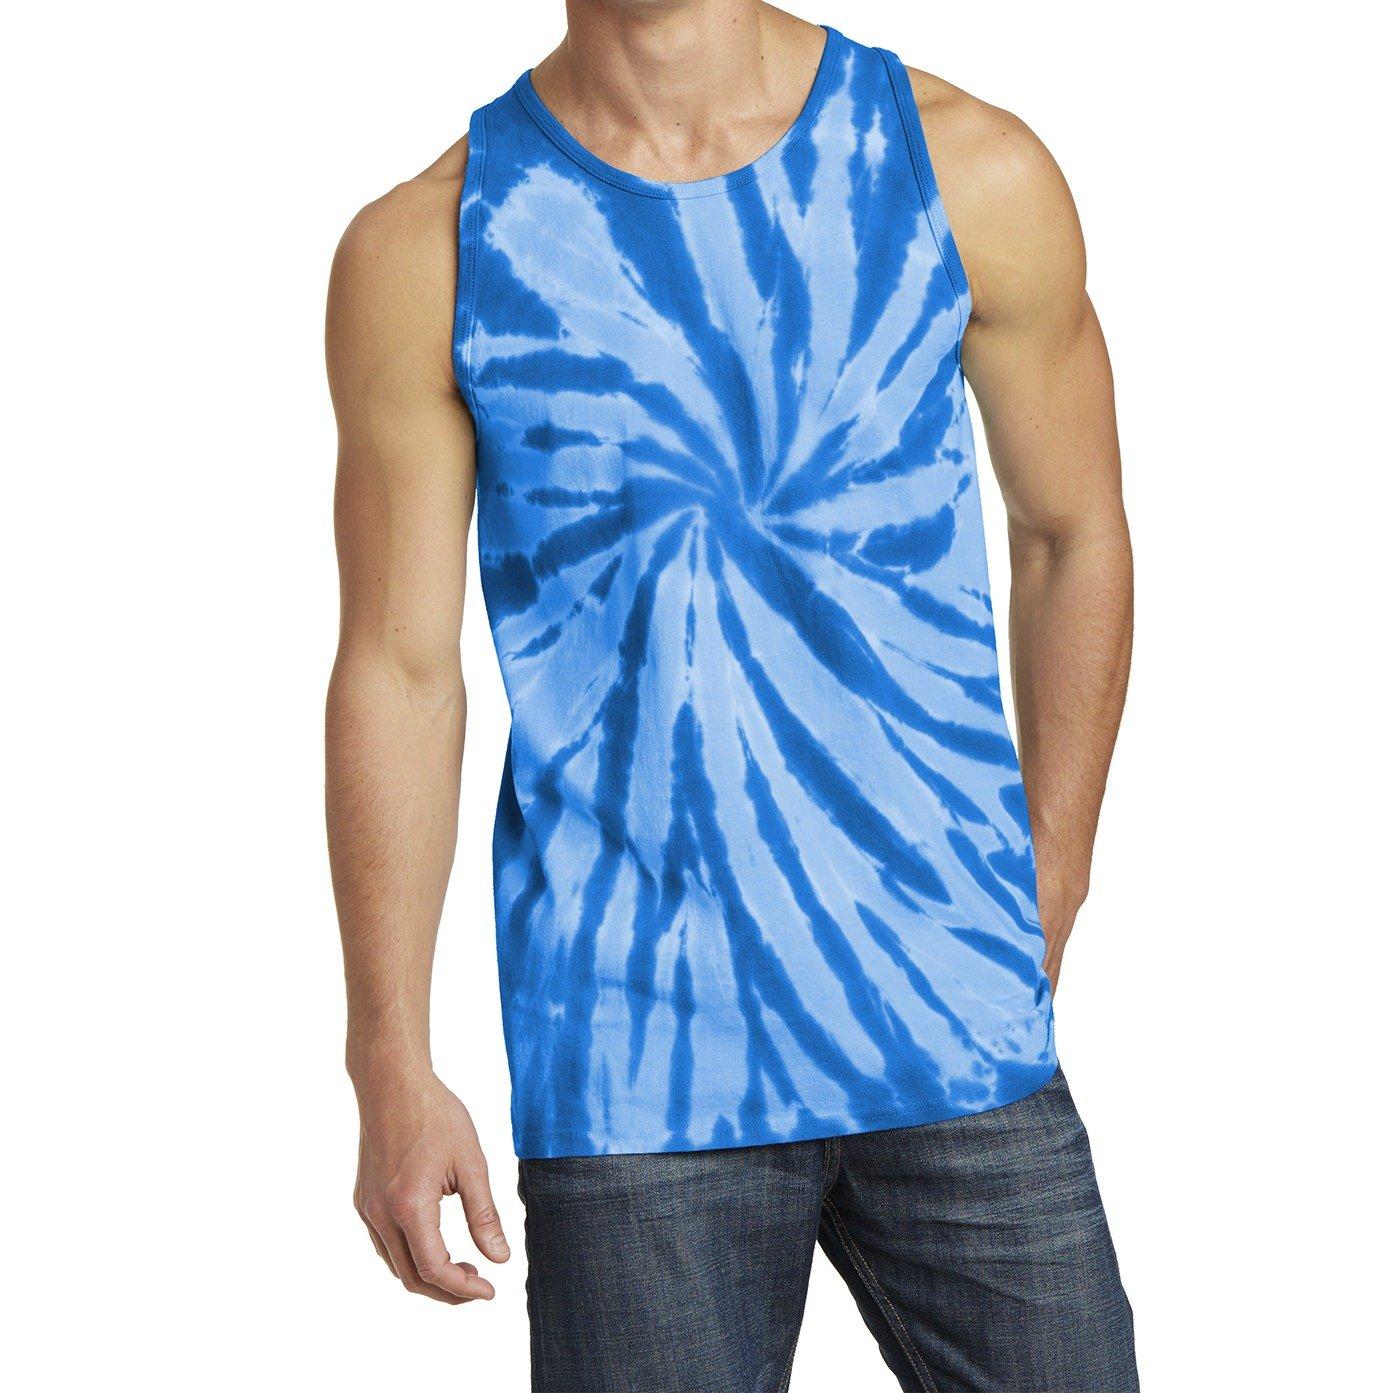 Mafoose Men's Tie-Dye Tank Top